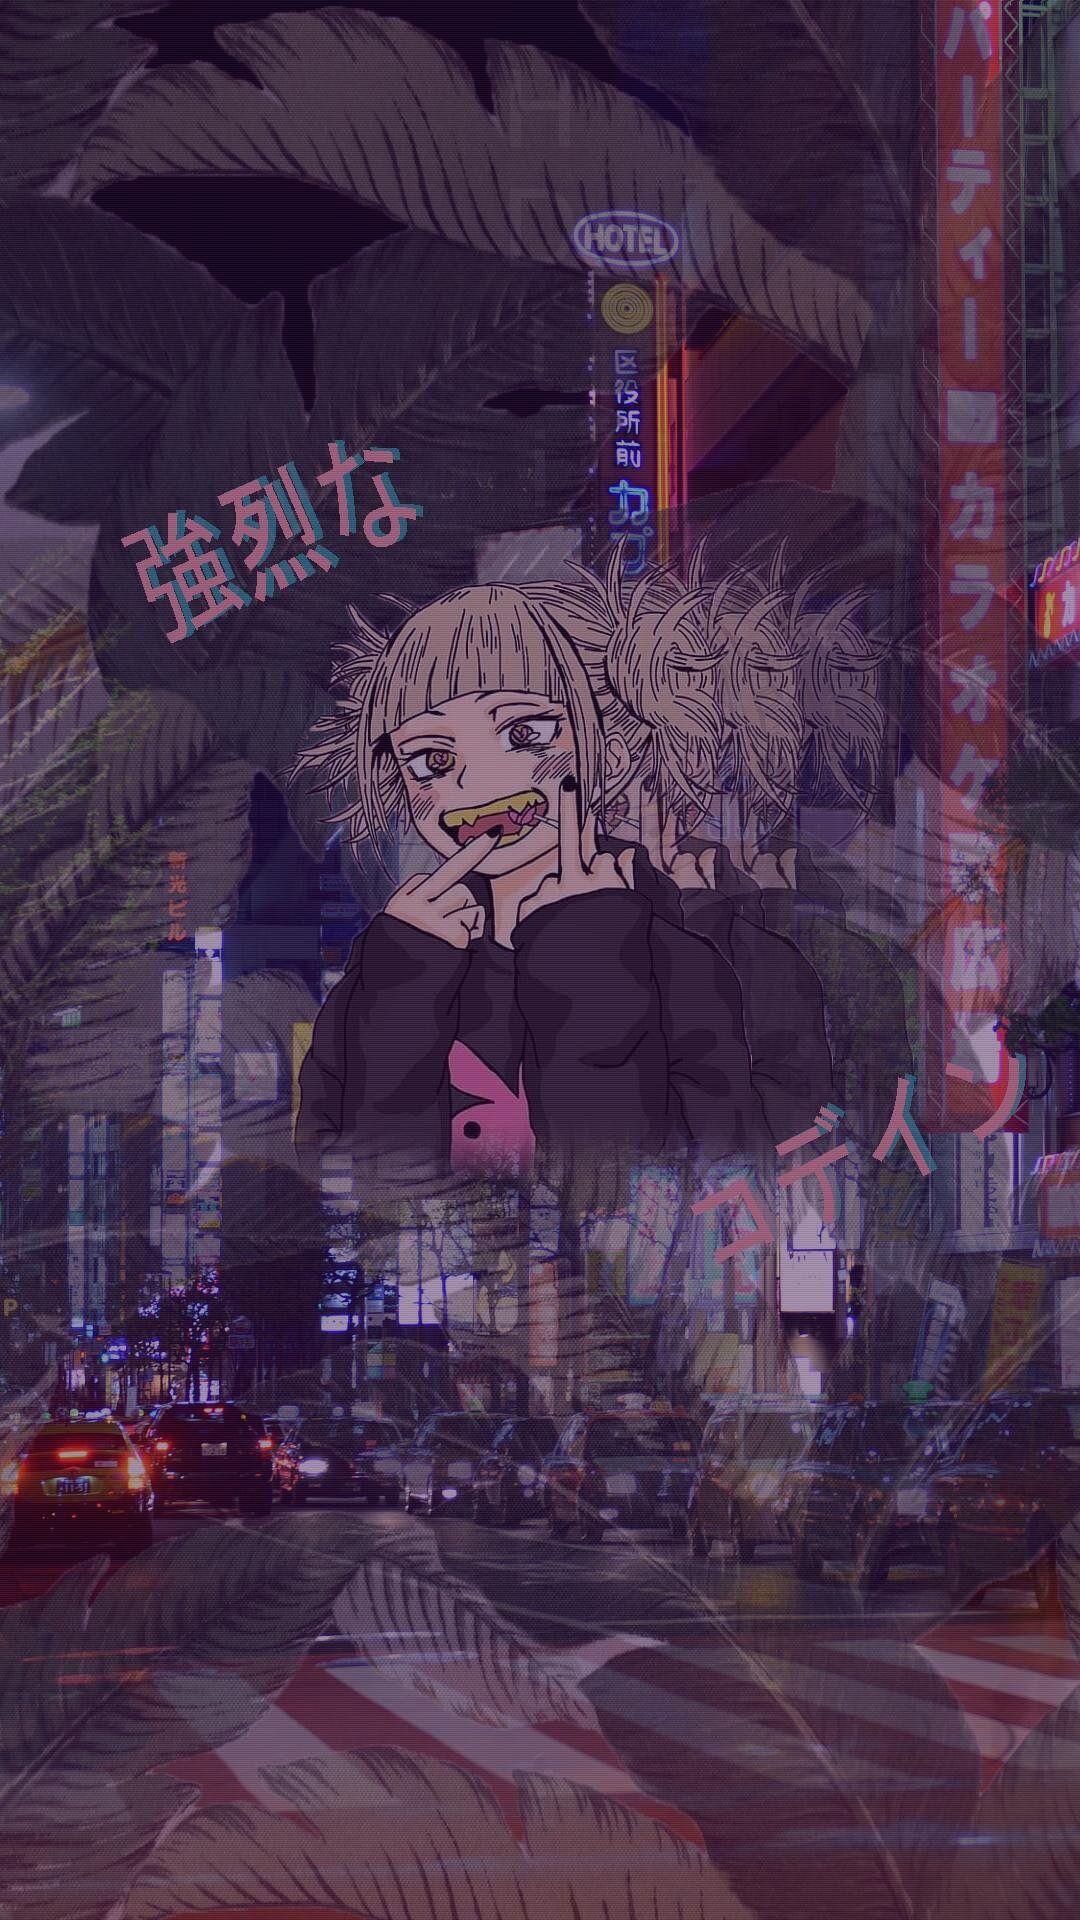 Aesthetic Anime Wallpaper Iphone X